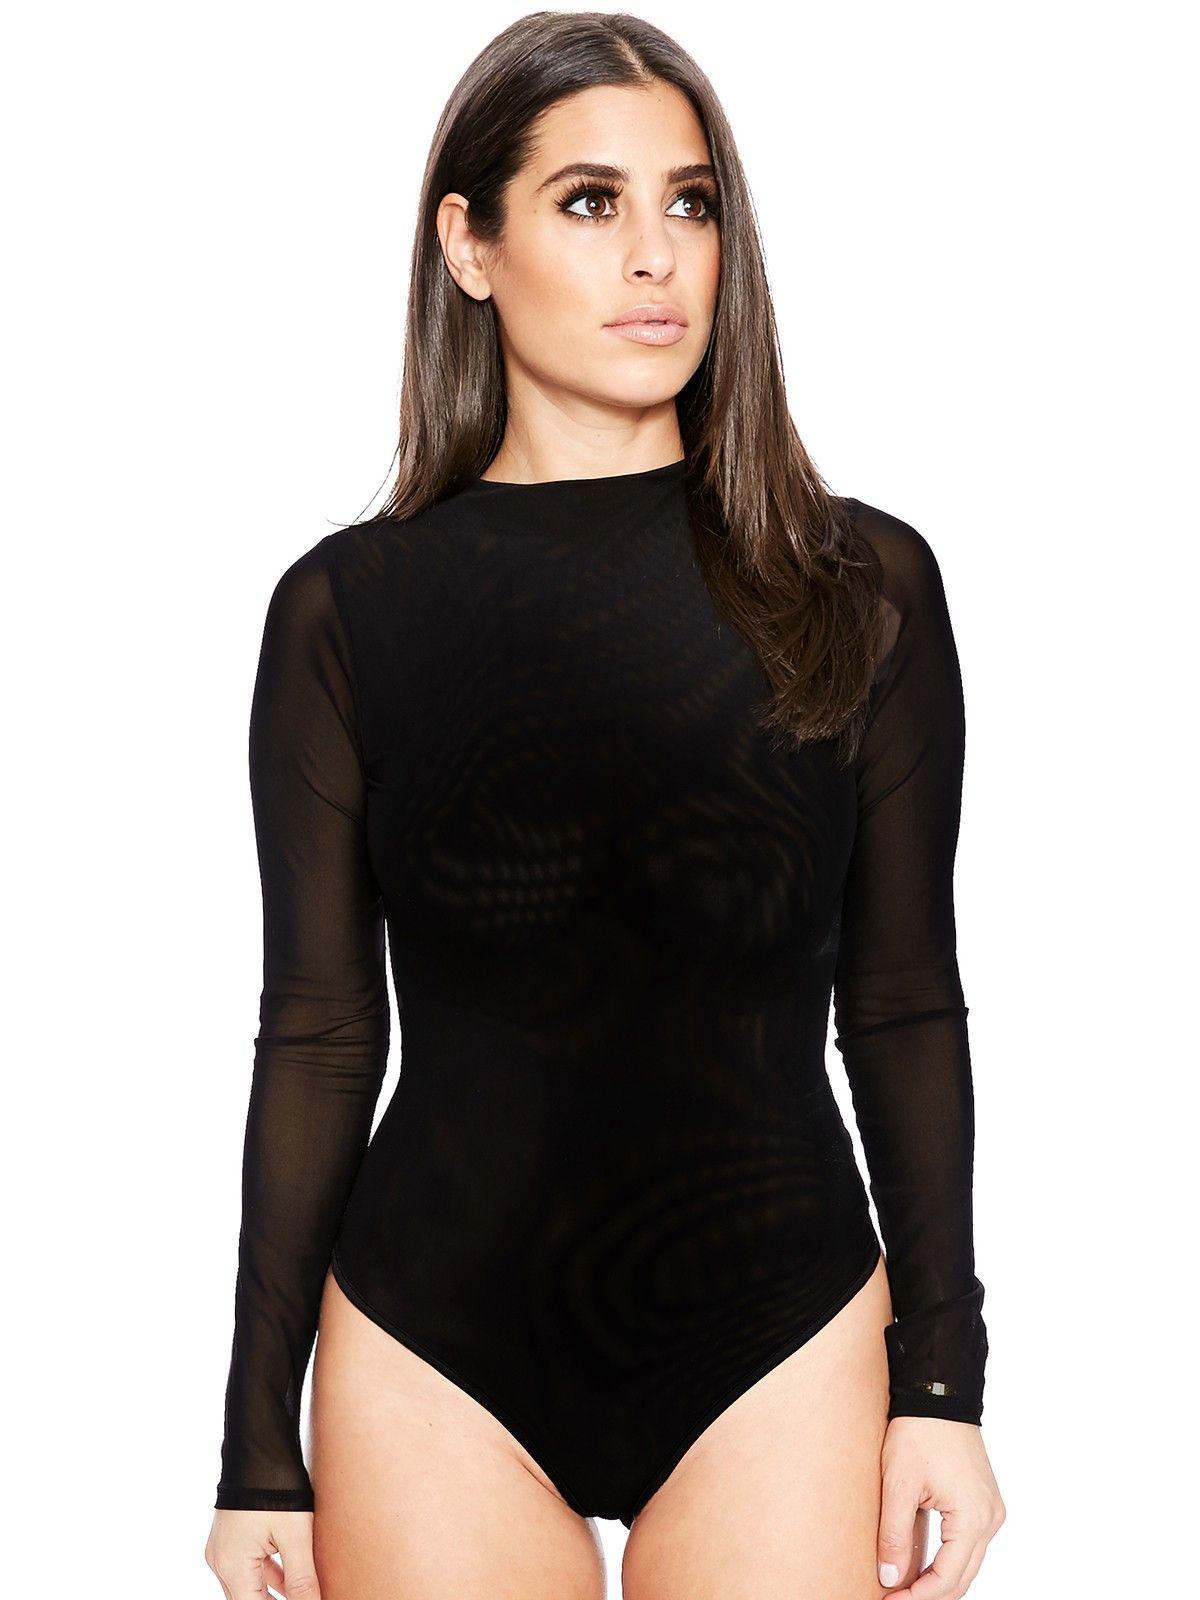 The NW Mesh Bodysuit Naked Wardrobe S T Y L E